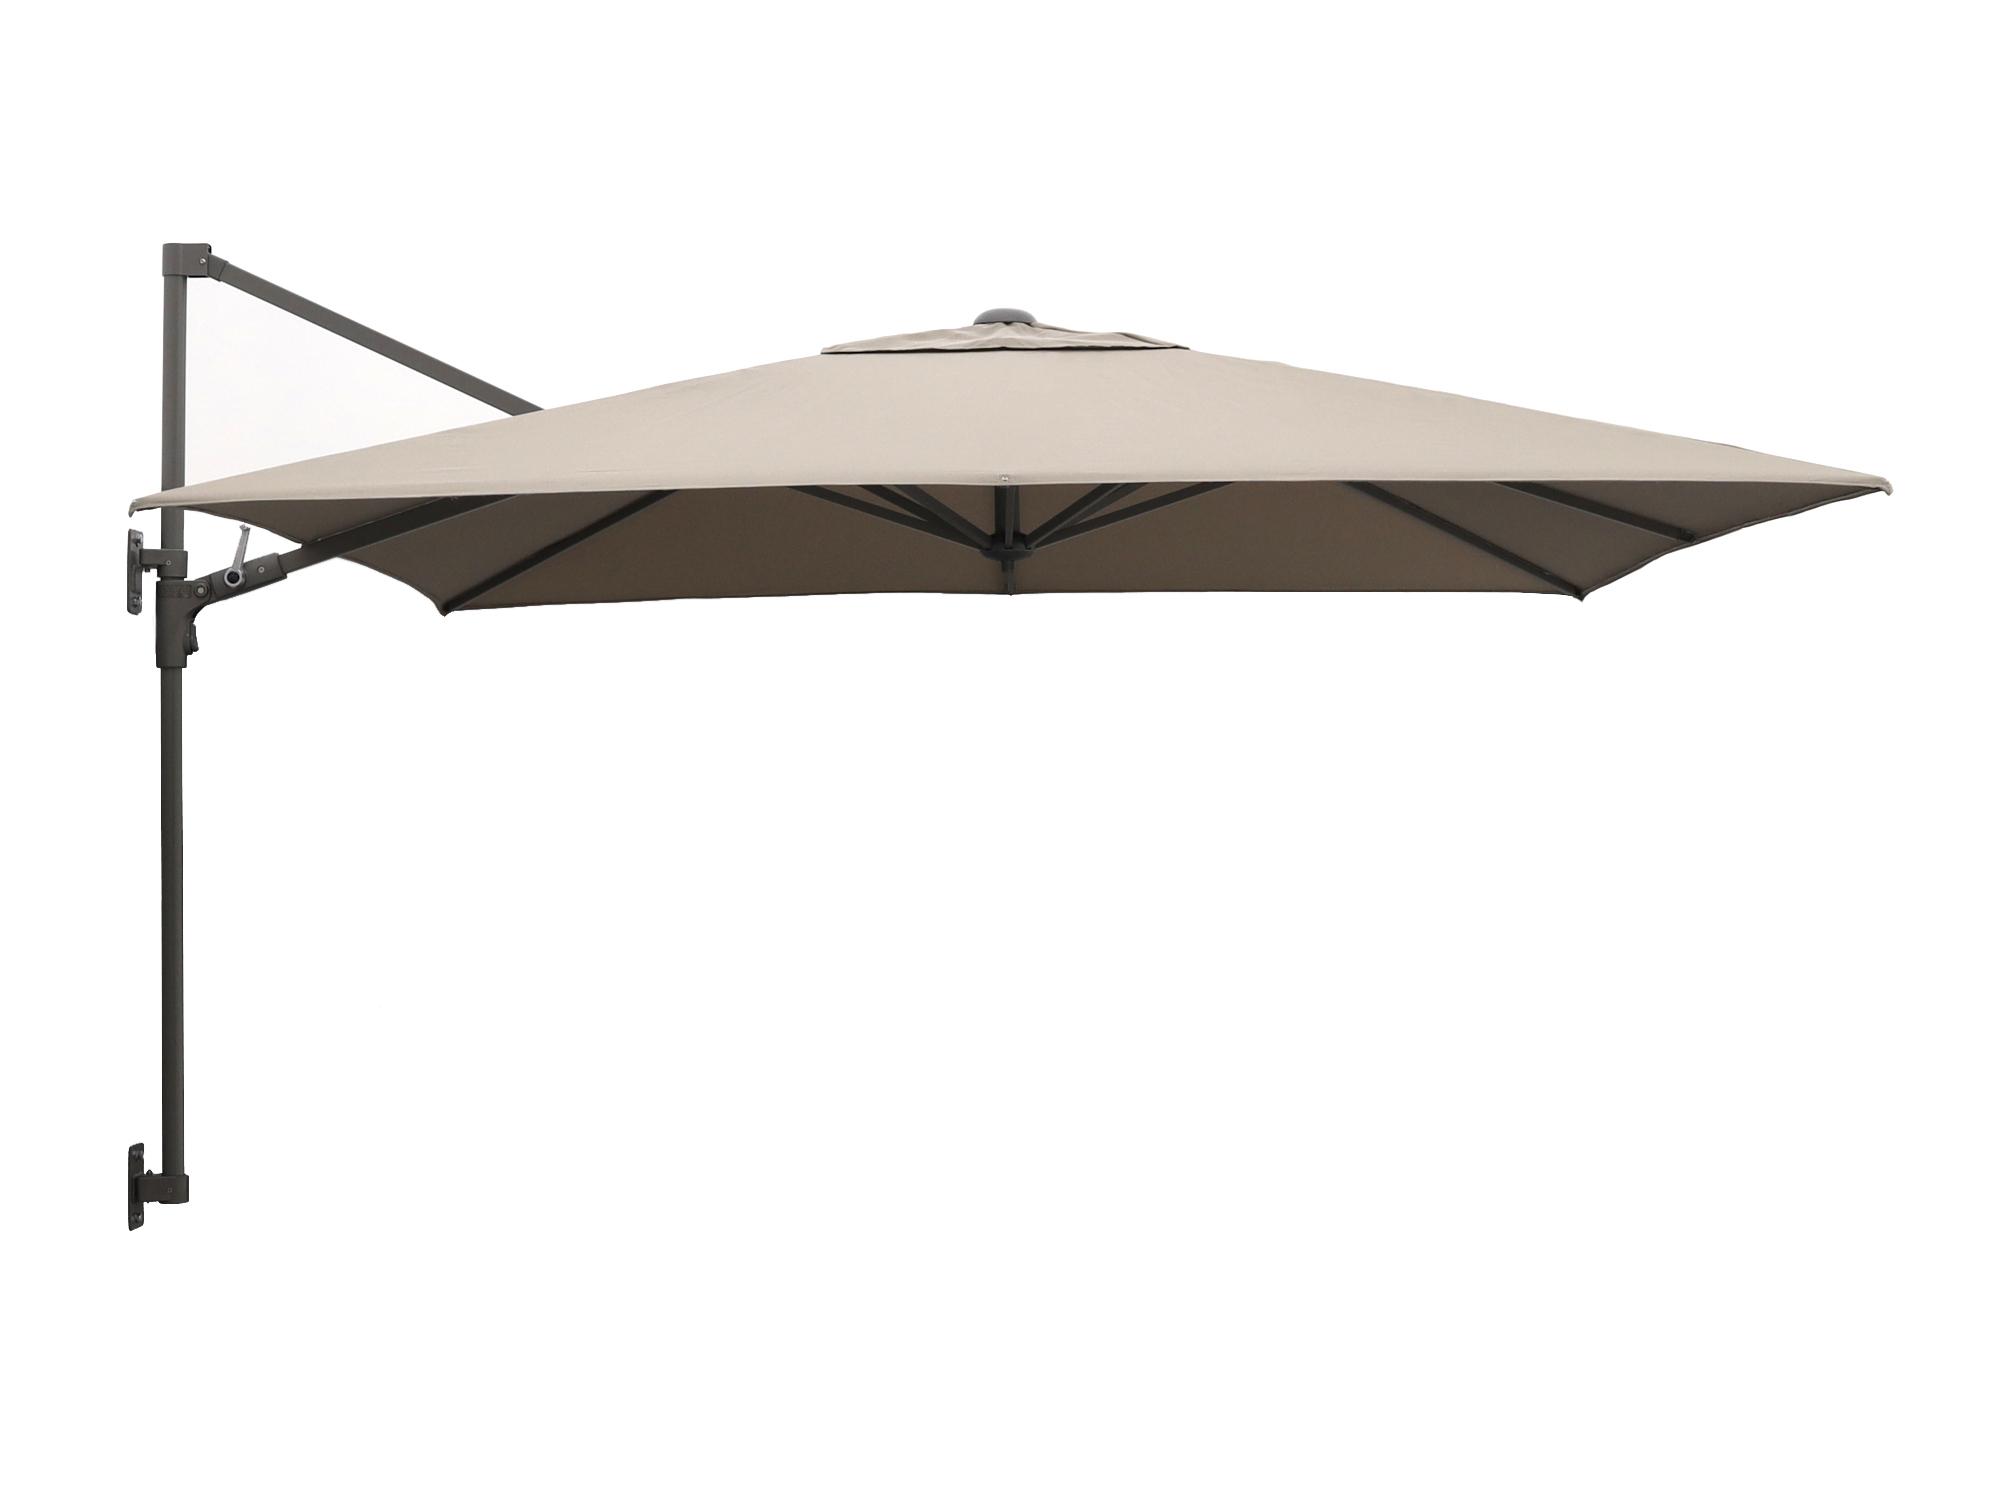 Shadowline muurparasol 250x250cm - Laagste prijsgarantie!